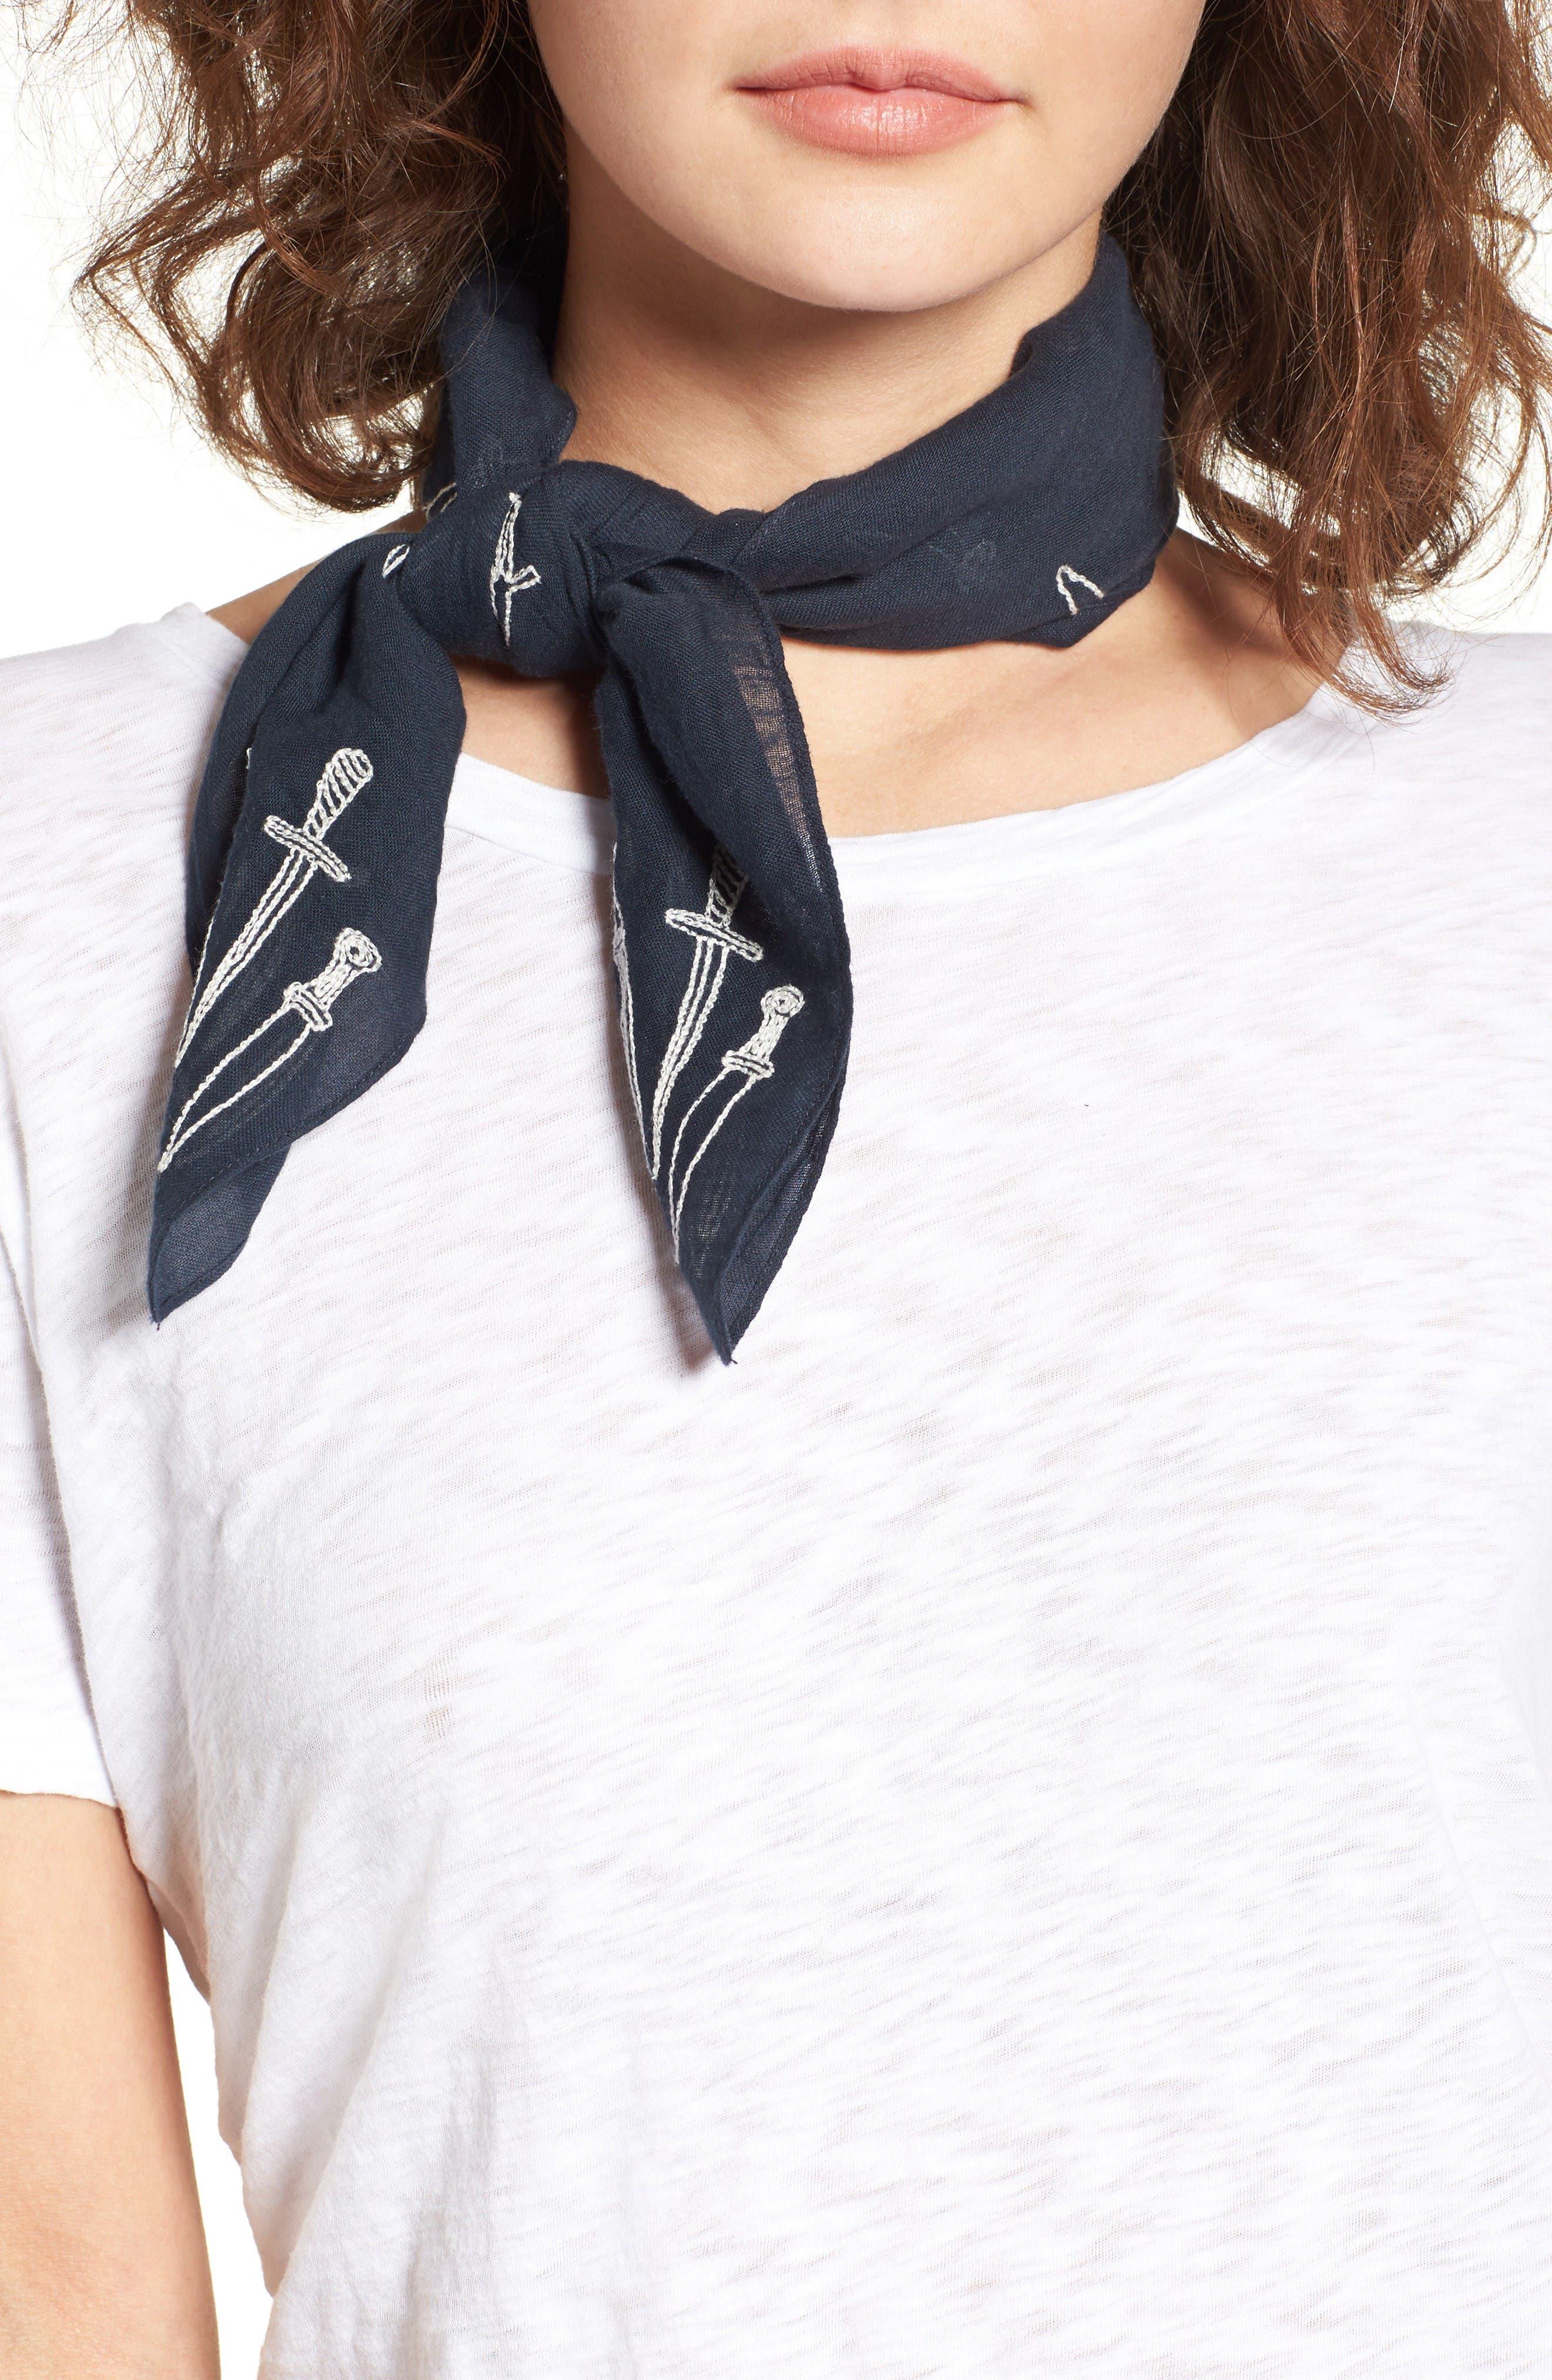 Alternate Image 1 Selected - rag & bone Embroidered Dagger Bandana